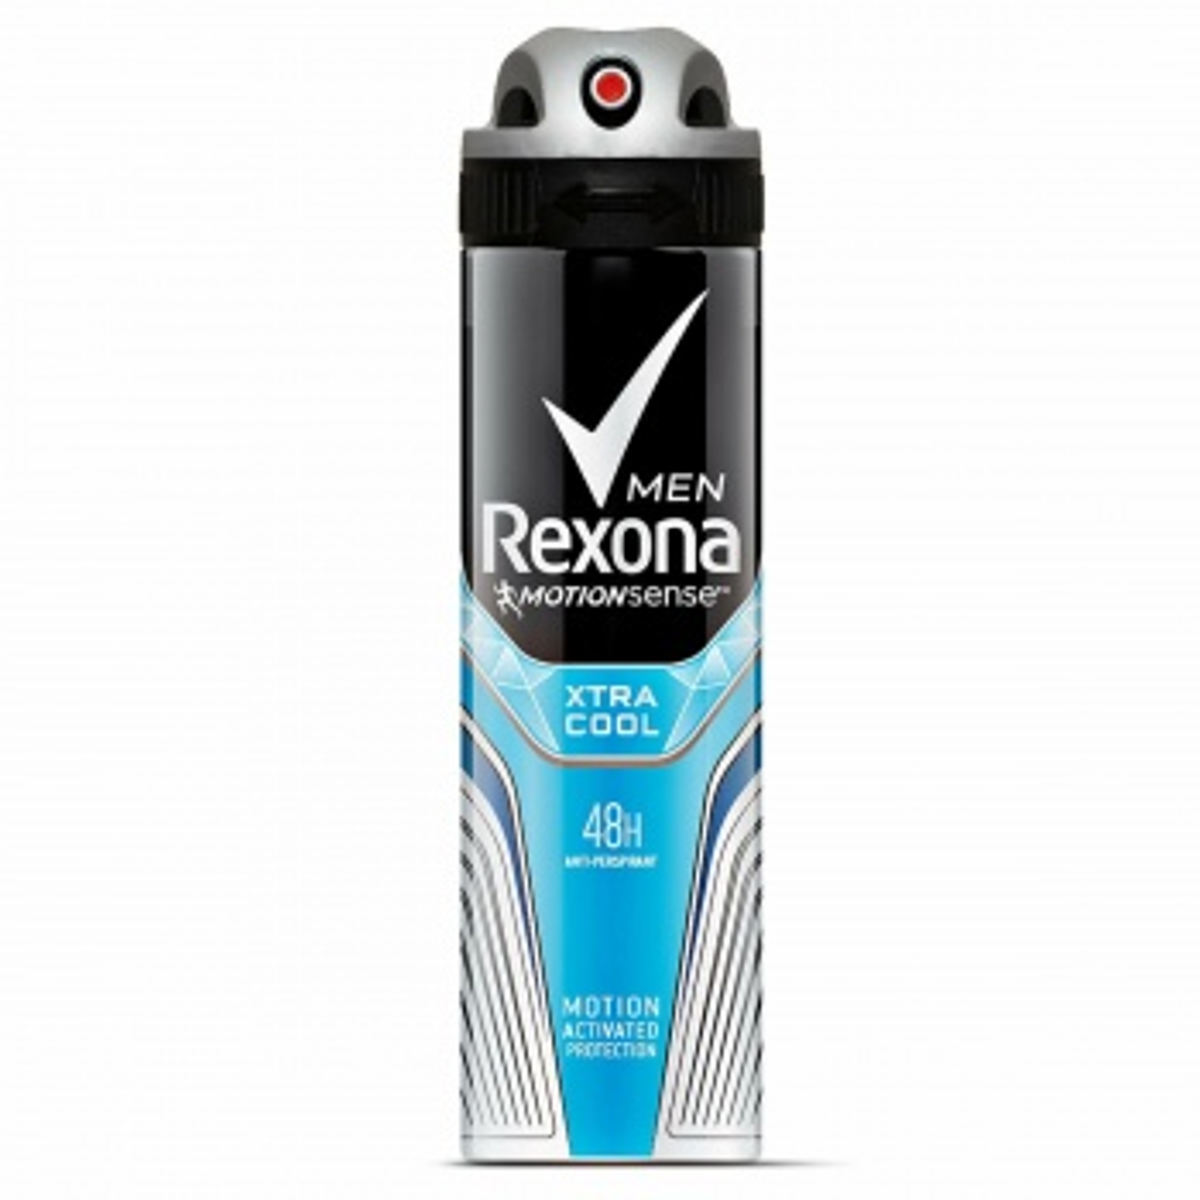 Rexona Men Motion Sense Xtra Cool 150 Ml